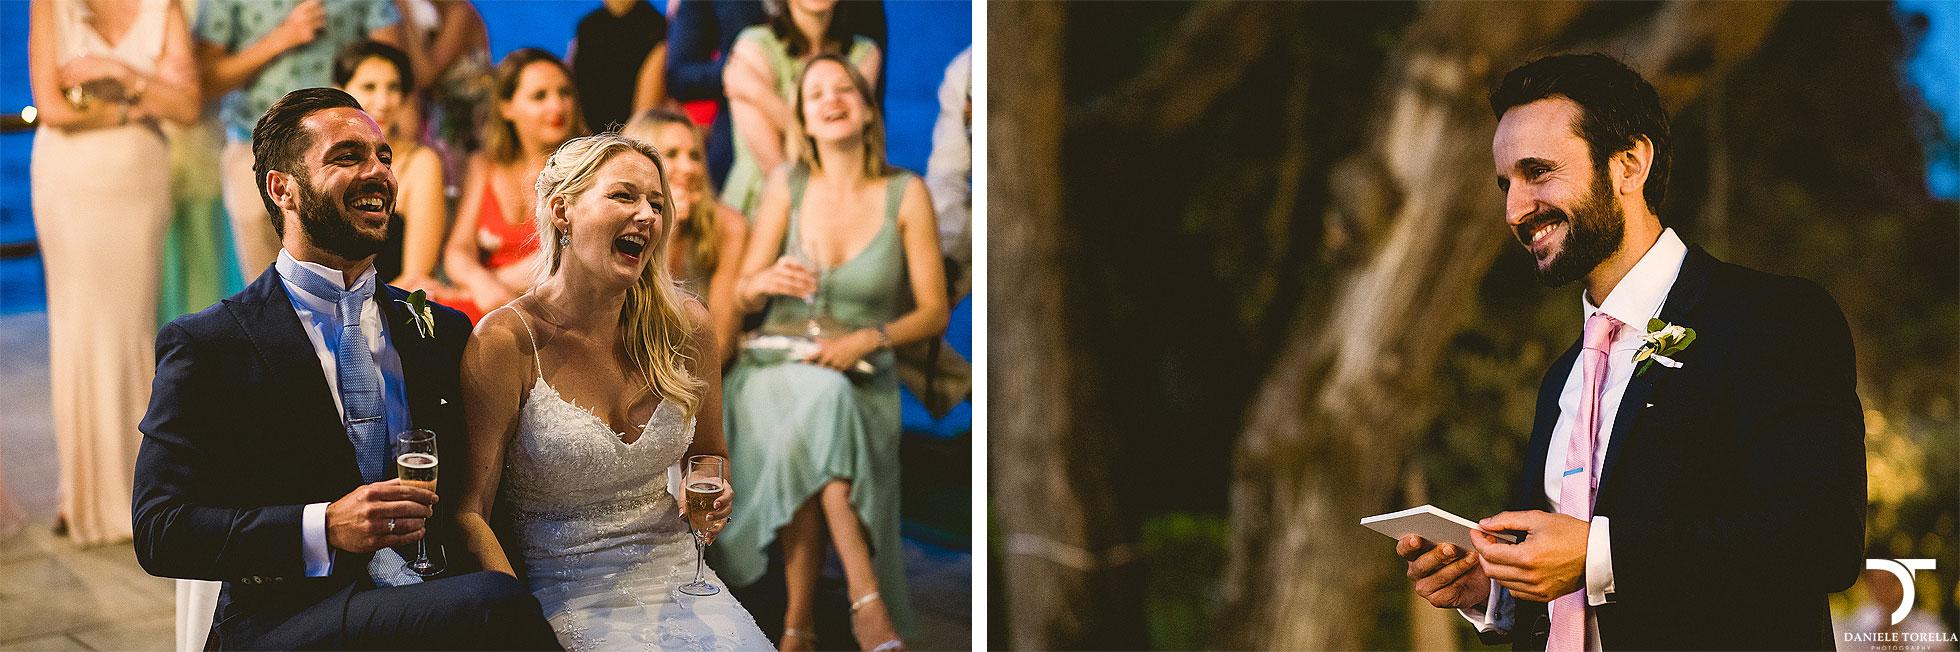 Best Wedding Photographer Rome